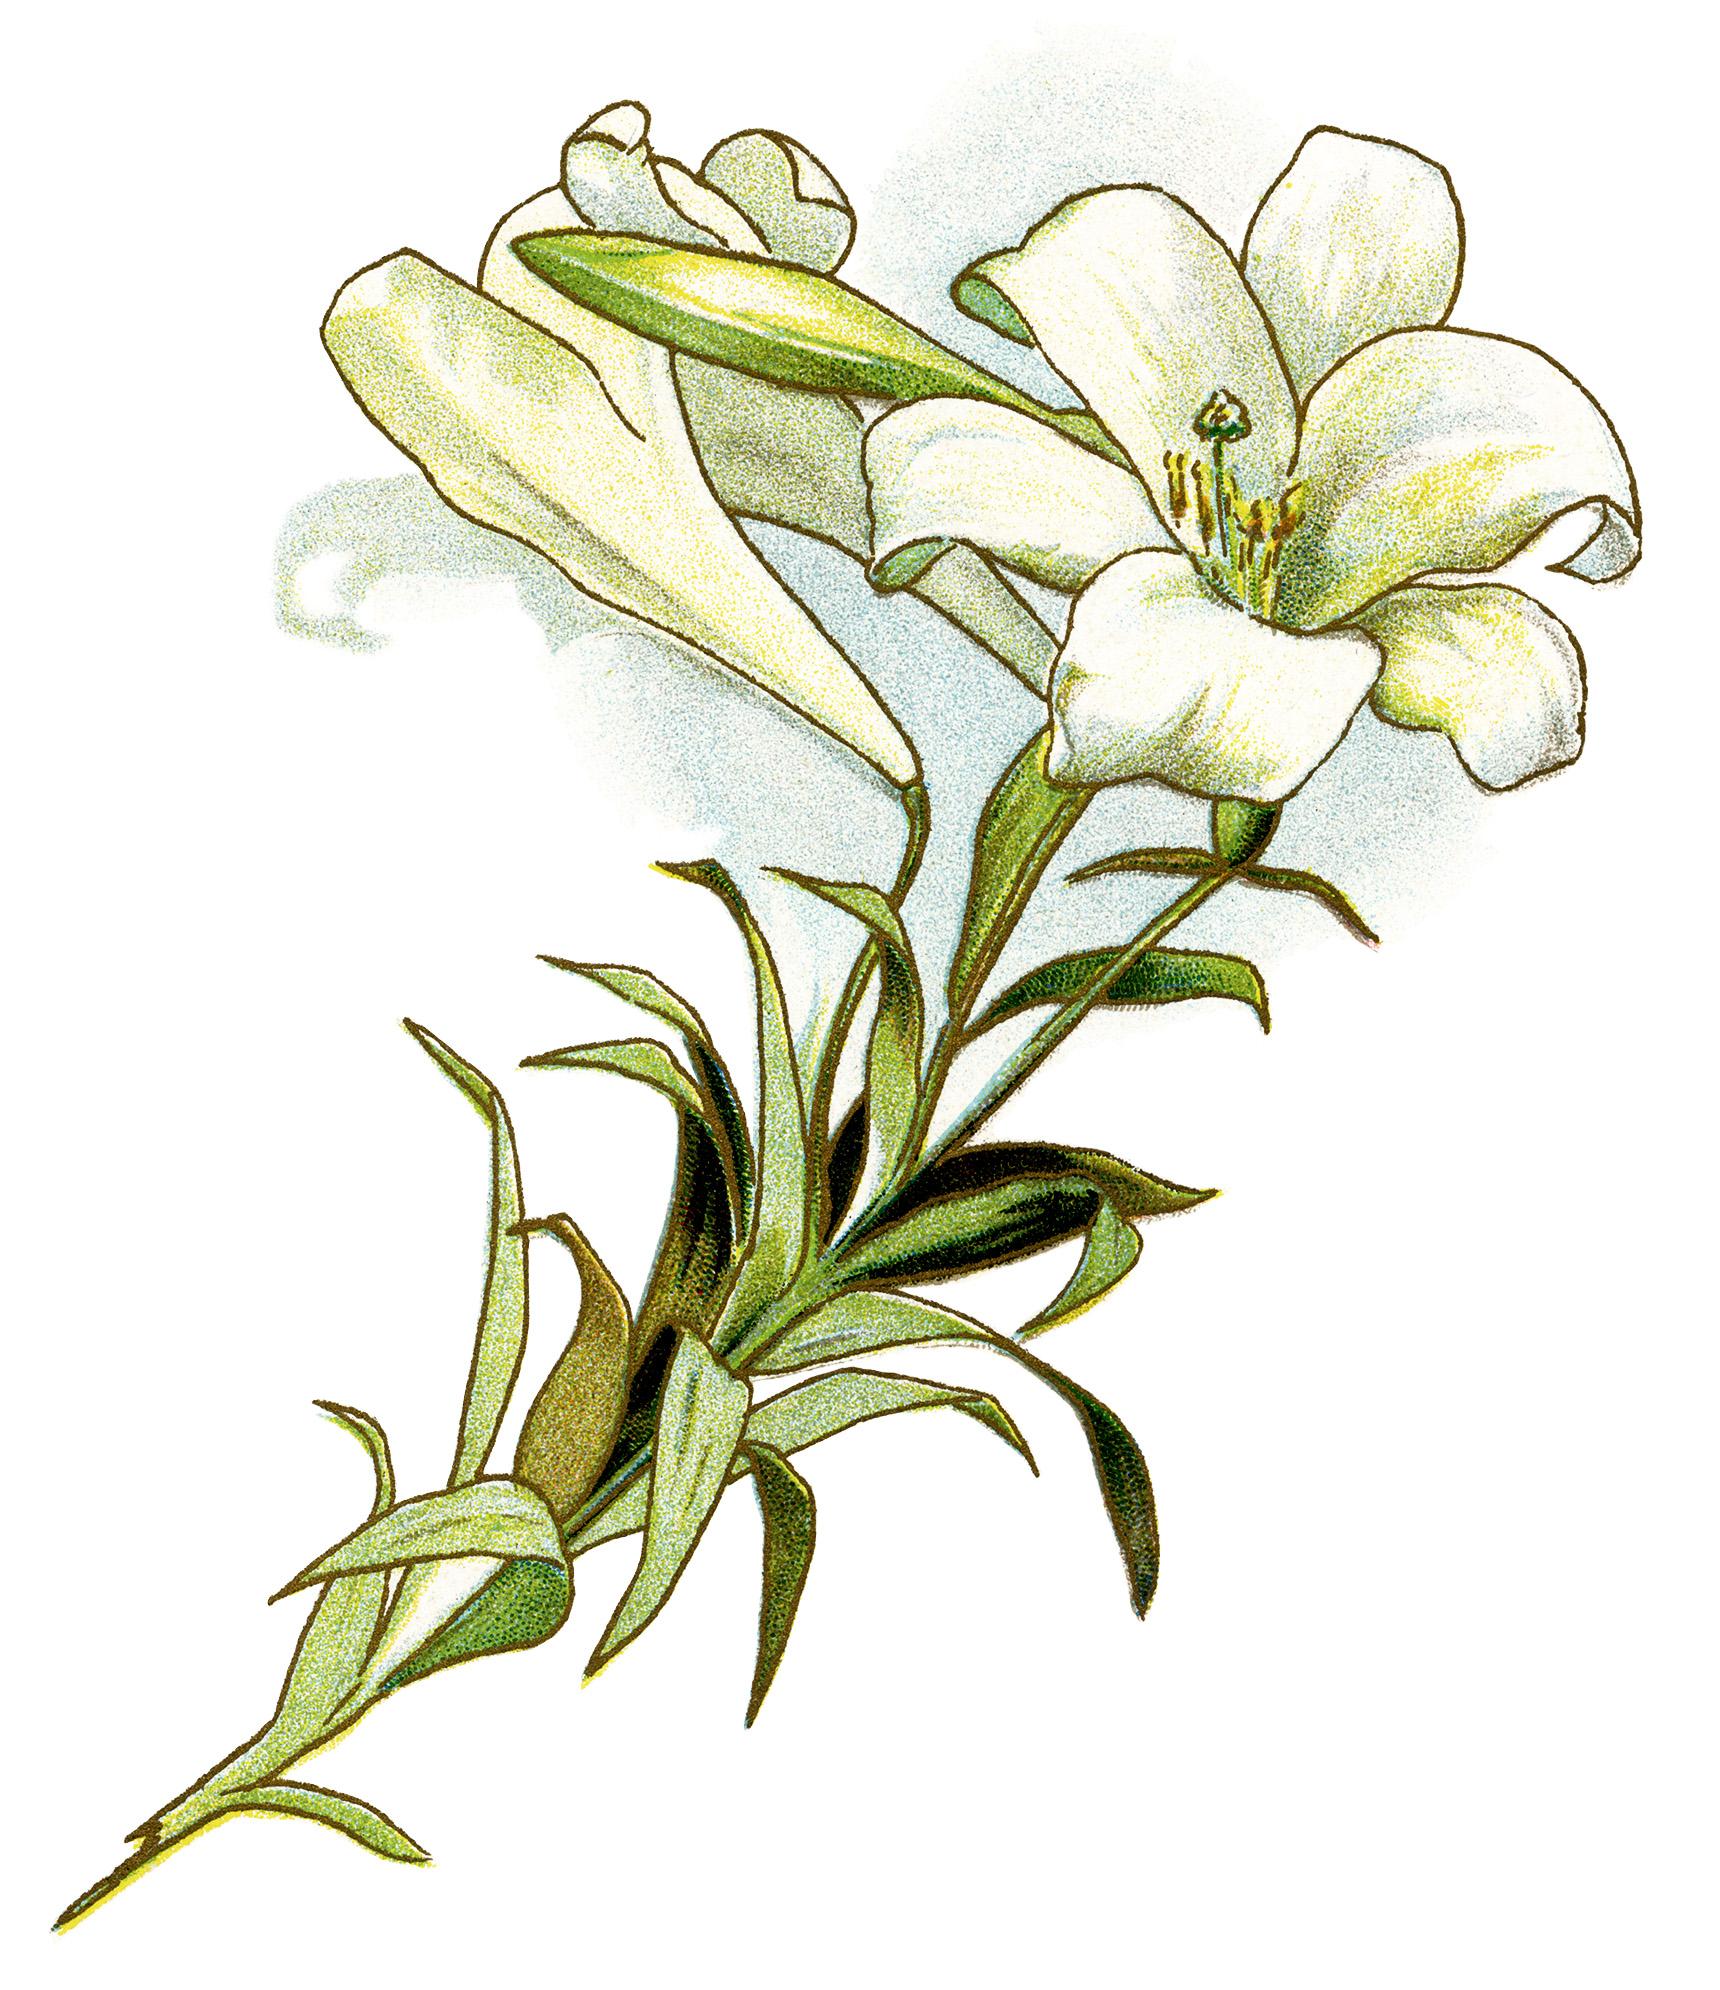 vintage flower clipart, white lily image, easter lily illustration ...: olddesignshop.com/2014/03/white-lily-free-vintage-image